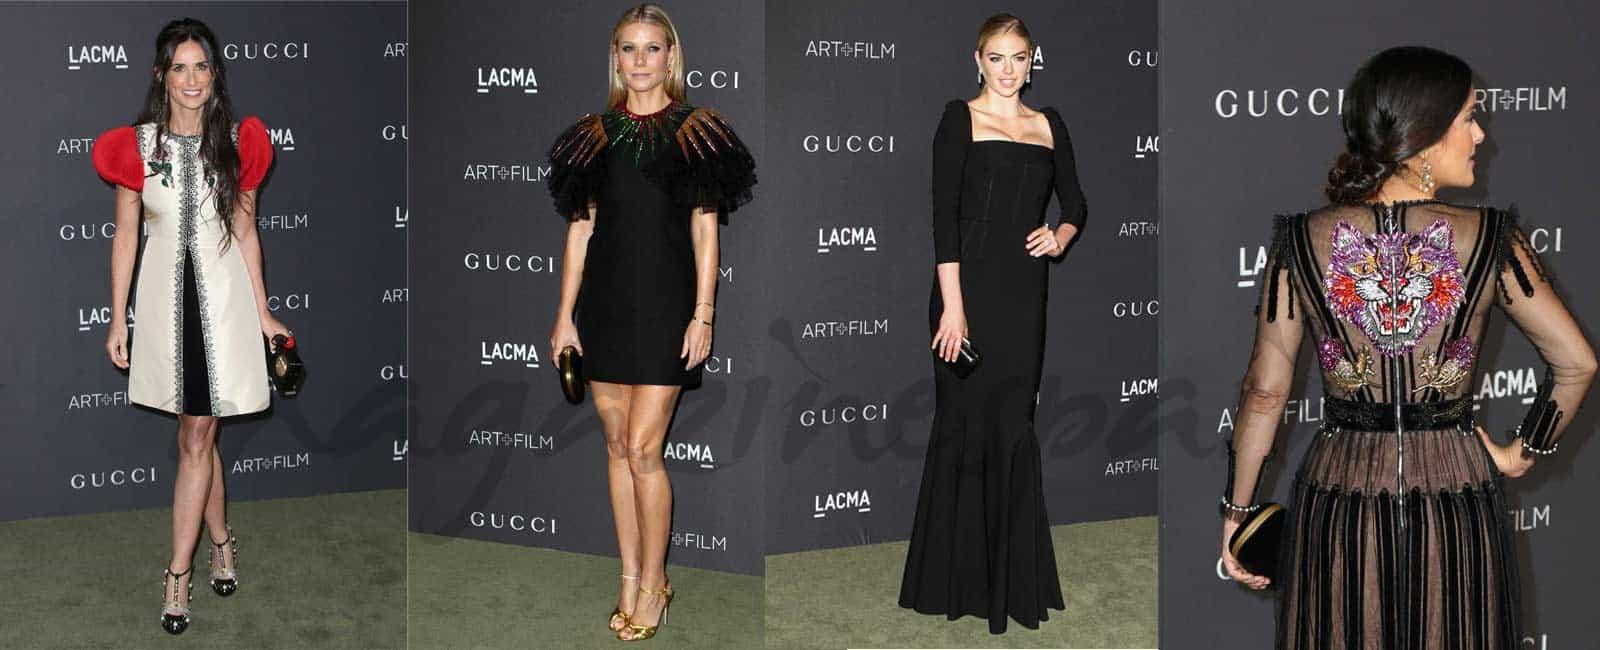 Gucci conquista en la Gala LACMA Art+Film